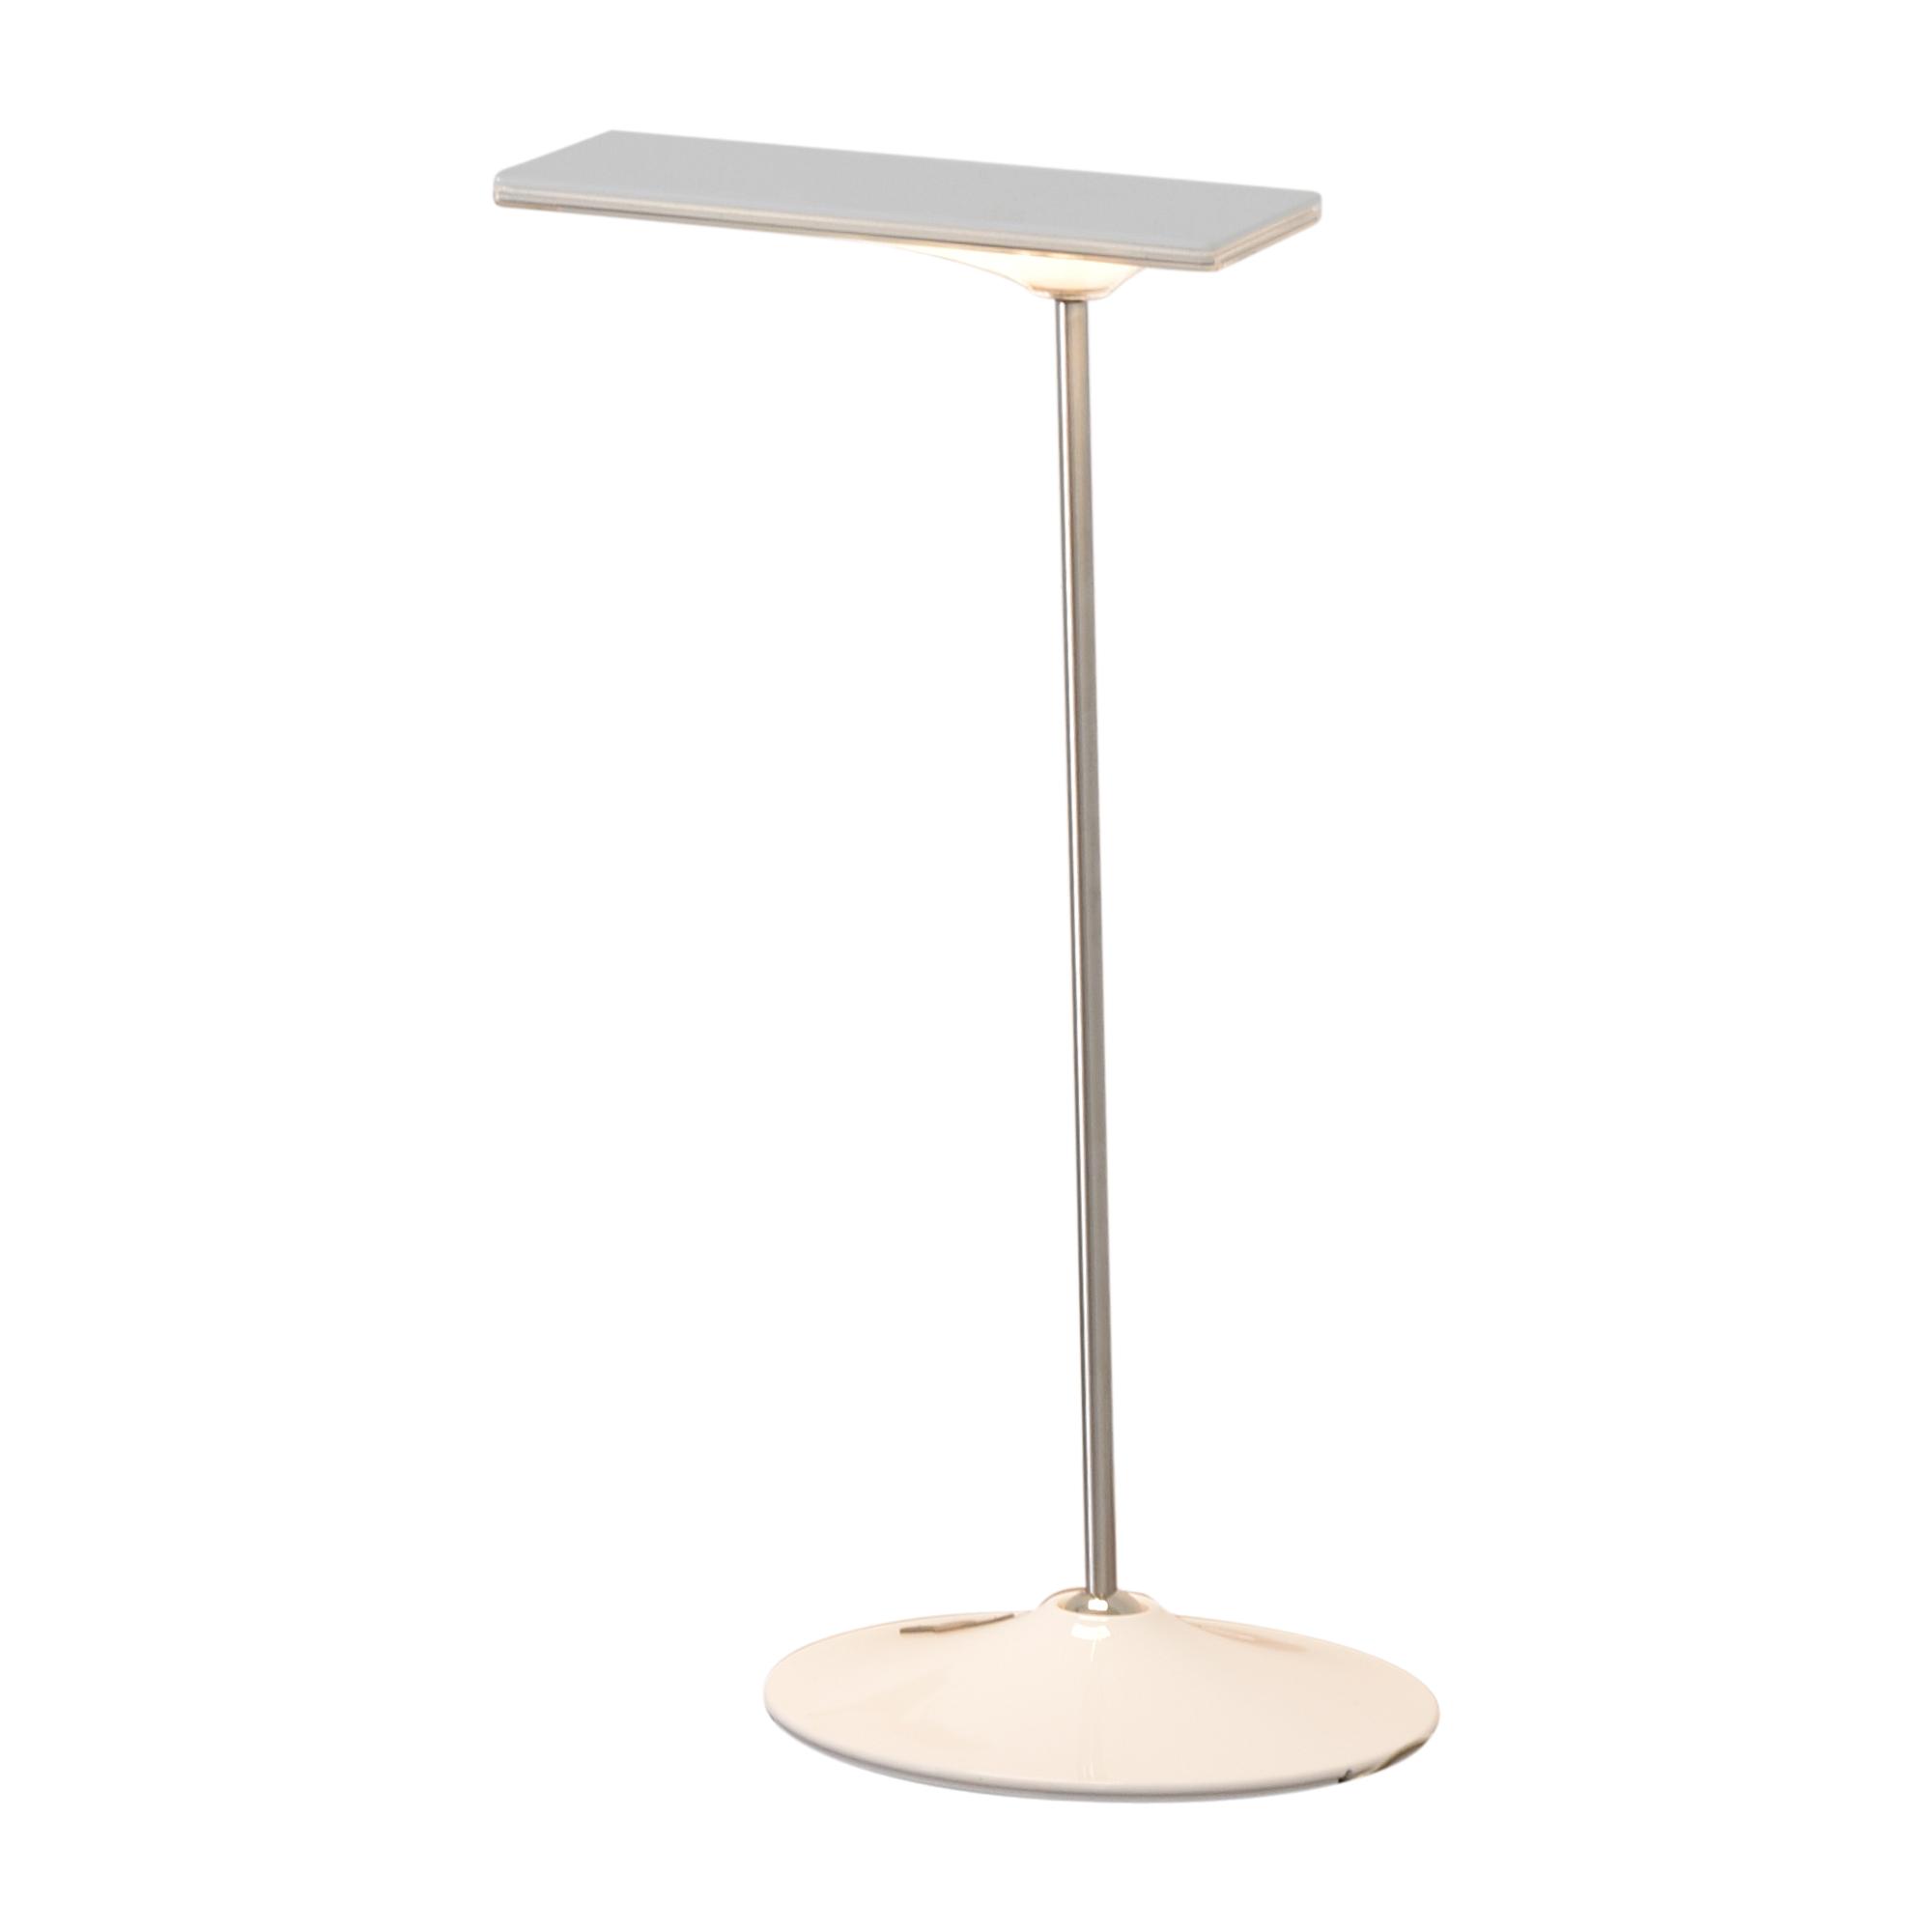 Room & Board Room & Board Horizon LED Table Lamp discount